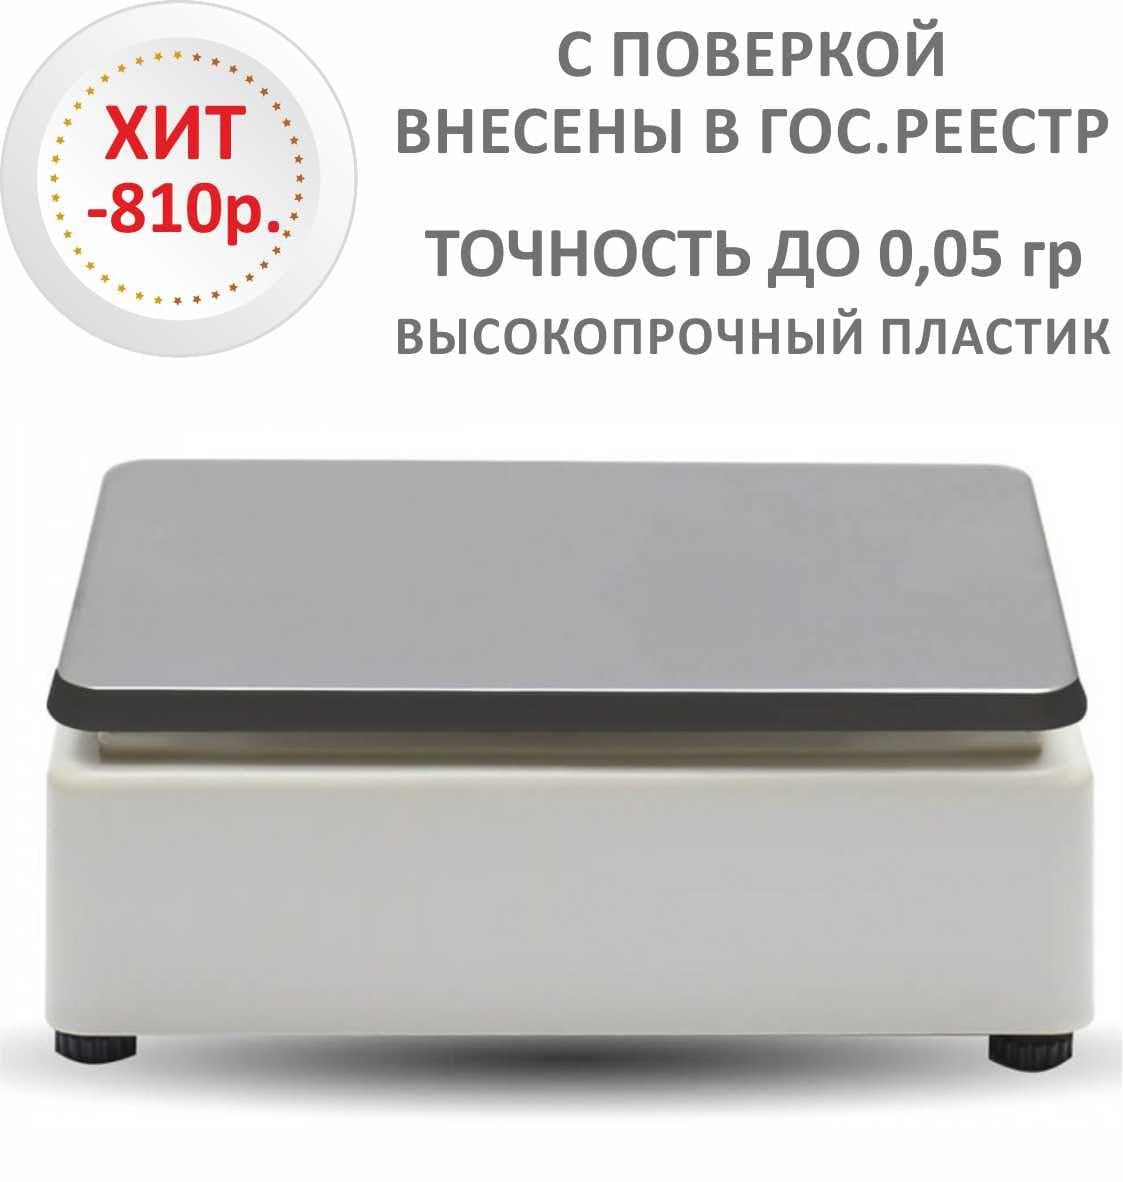 Весы лабораторные/аналитические M-ER 122 АCF-1500.05 ACCURATE LCD - вид сзади